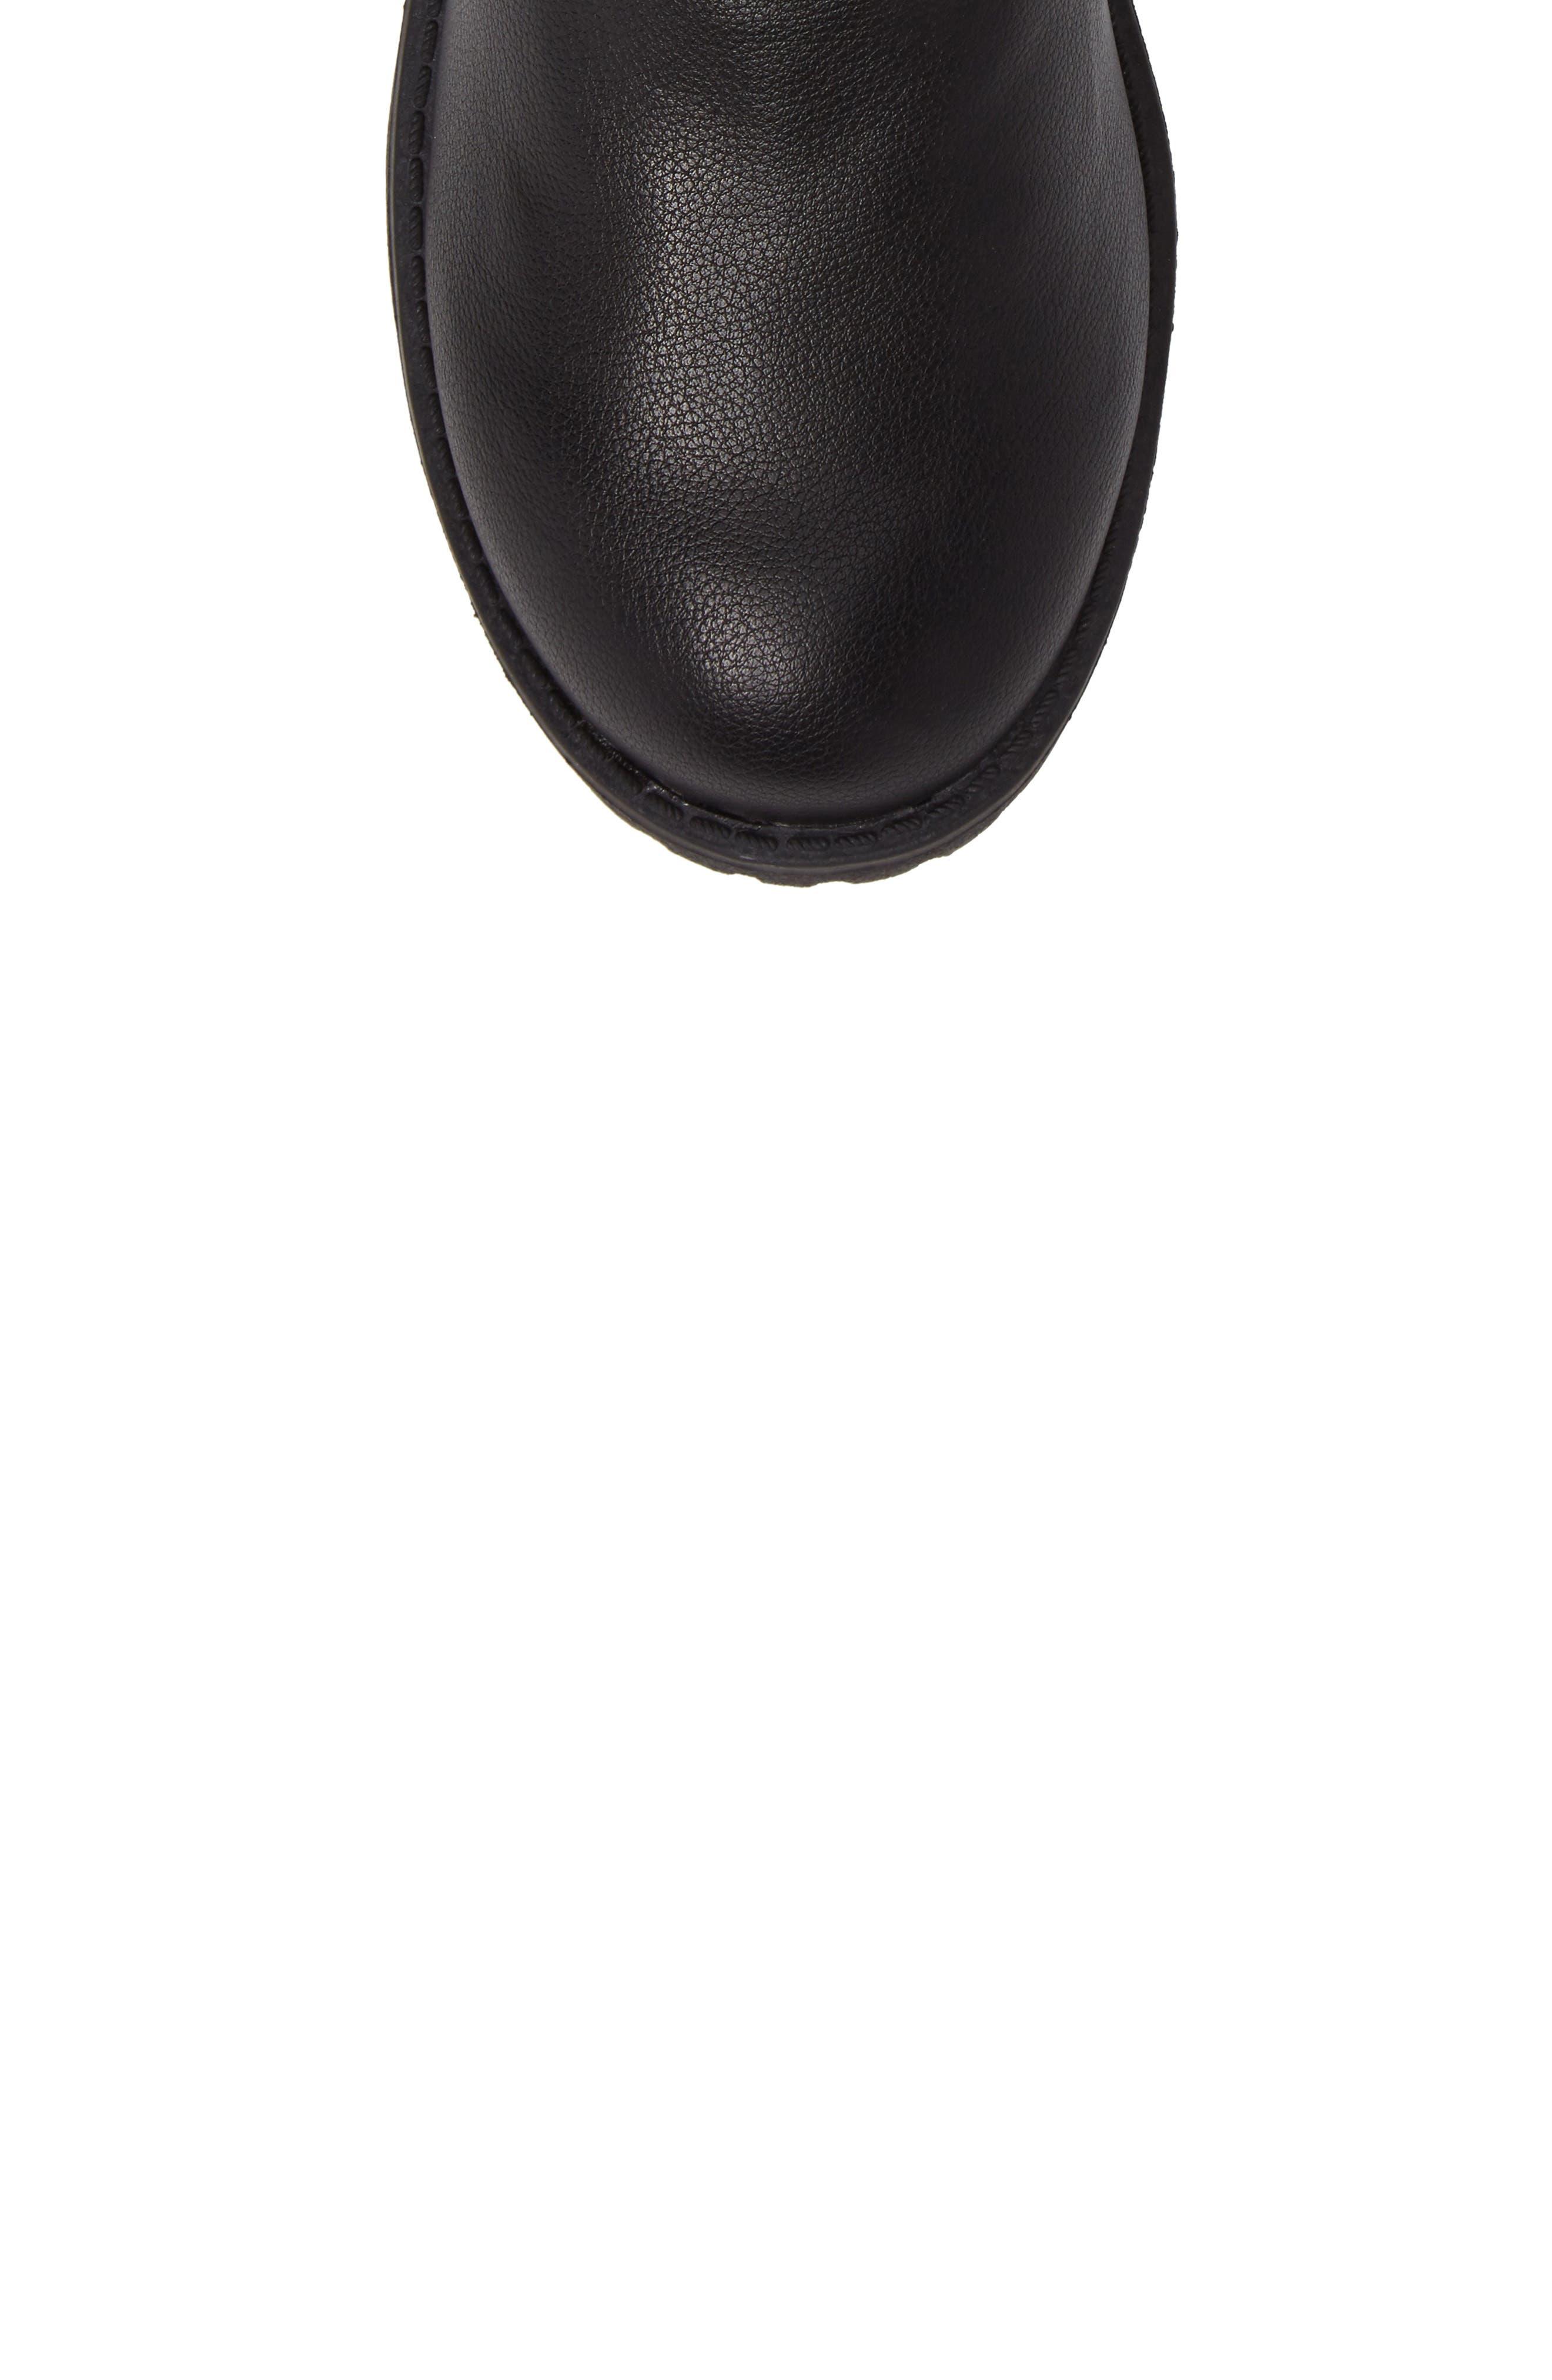 FRYE,                             Veronica Buckle-Strap Engineer Boot,                             Alternate thumbnail 5, color,                             BLACK